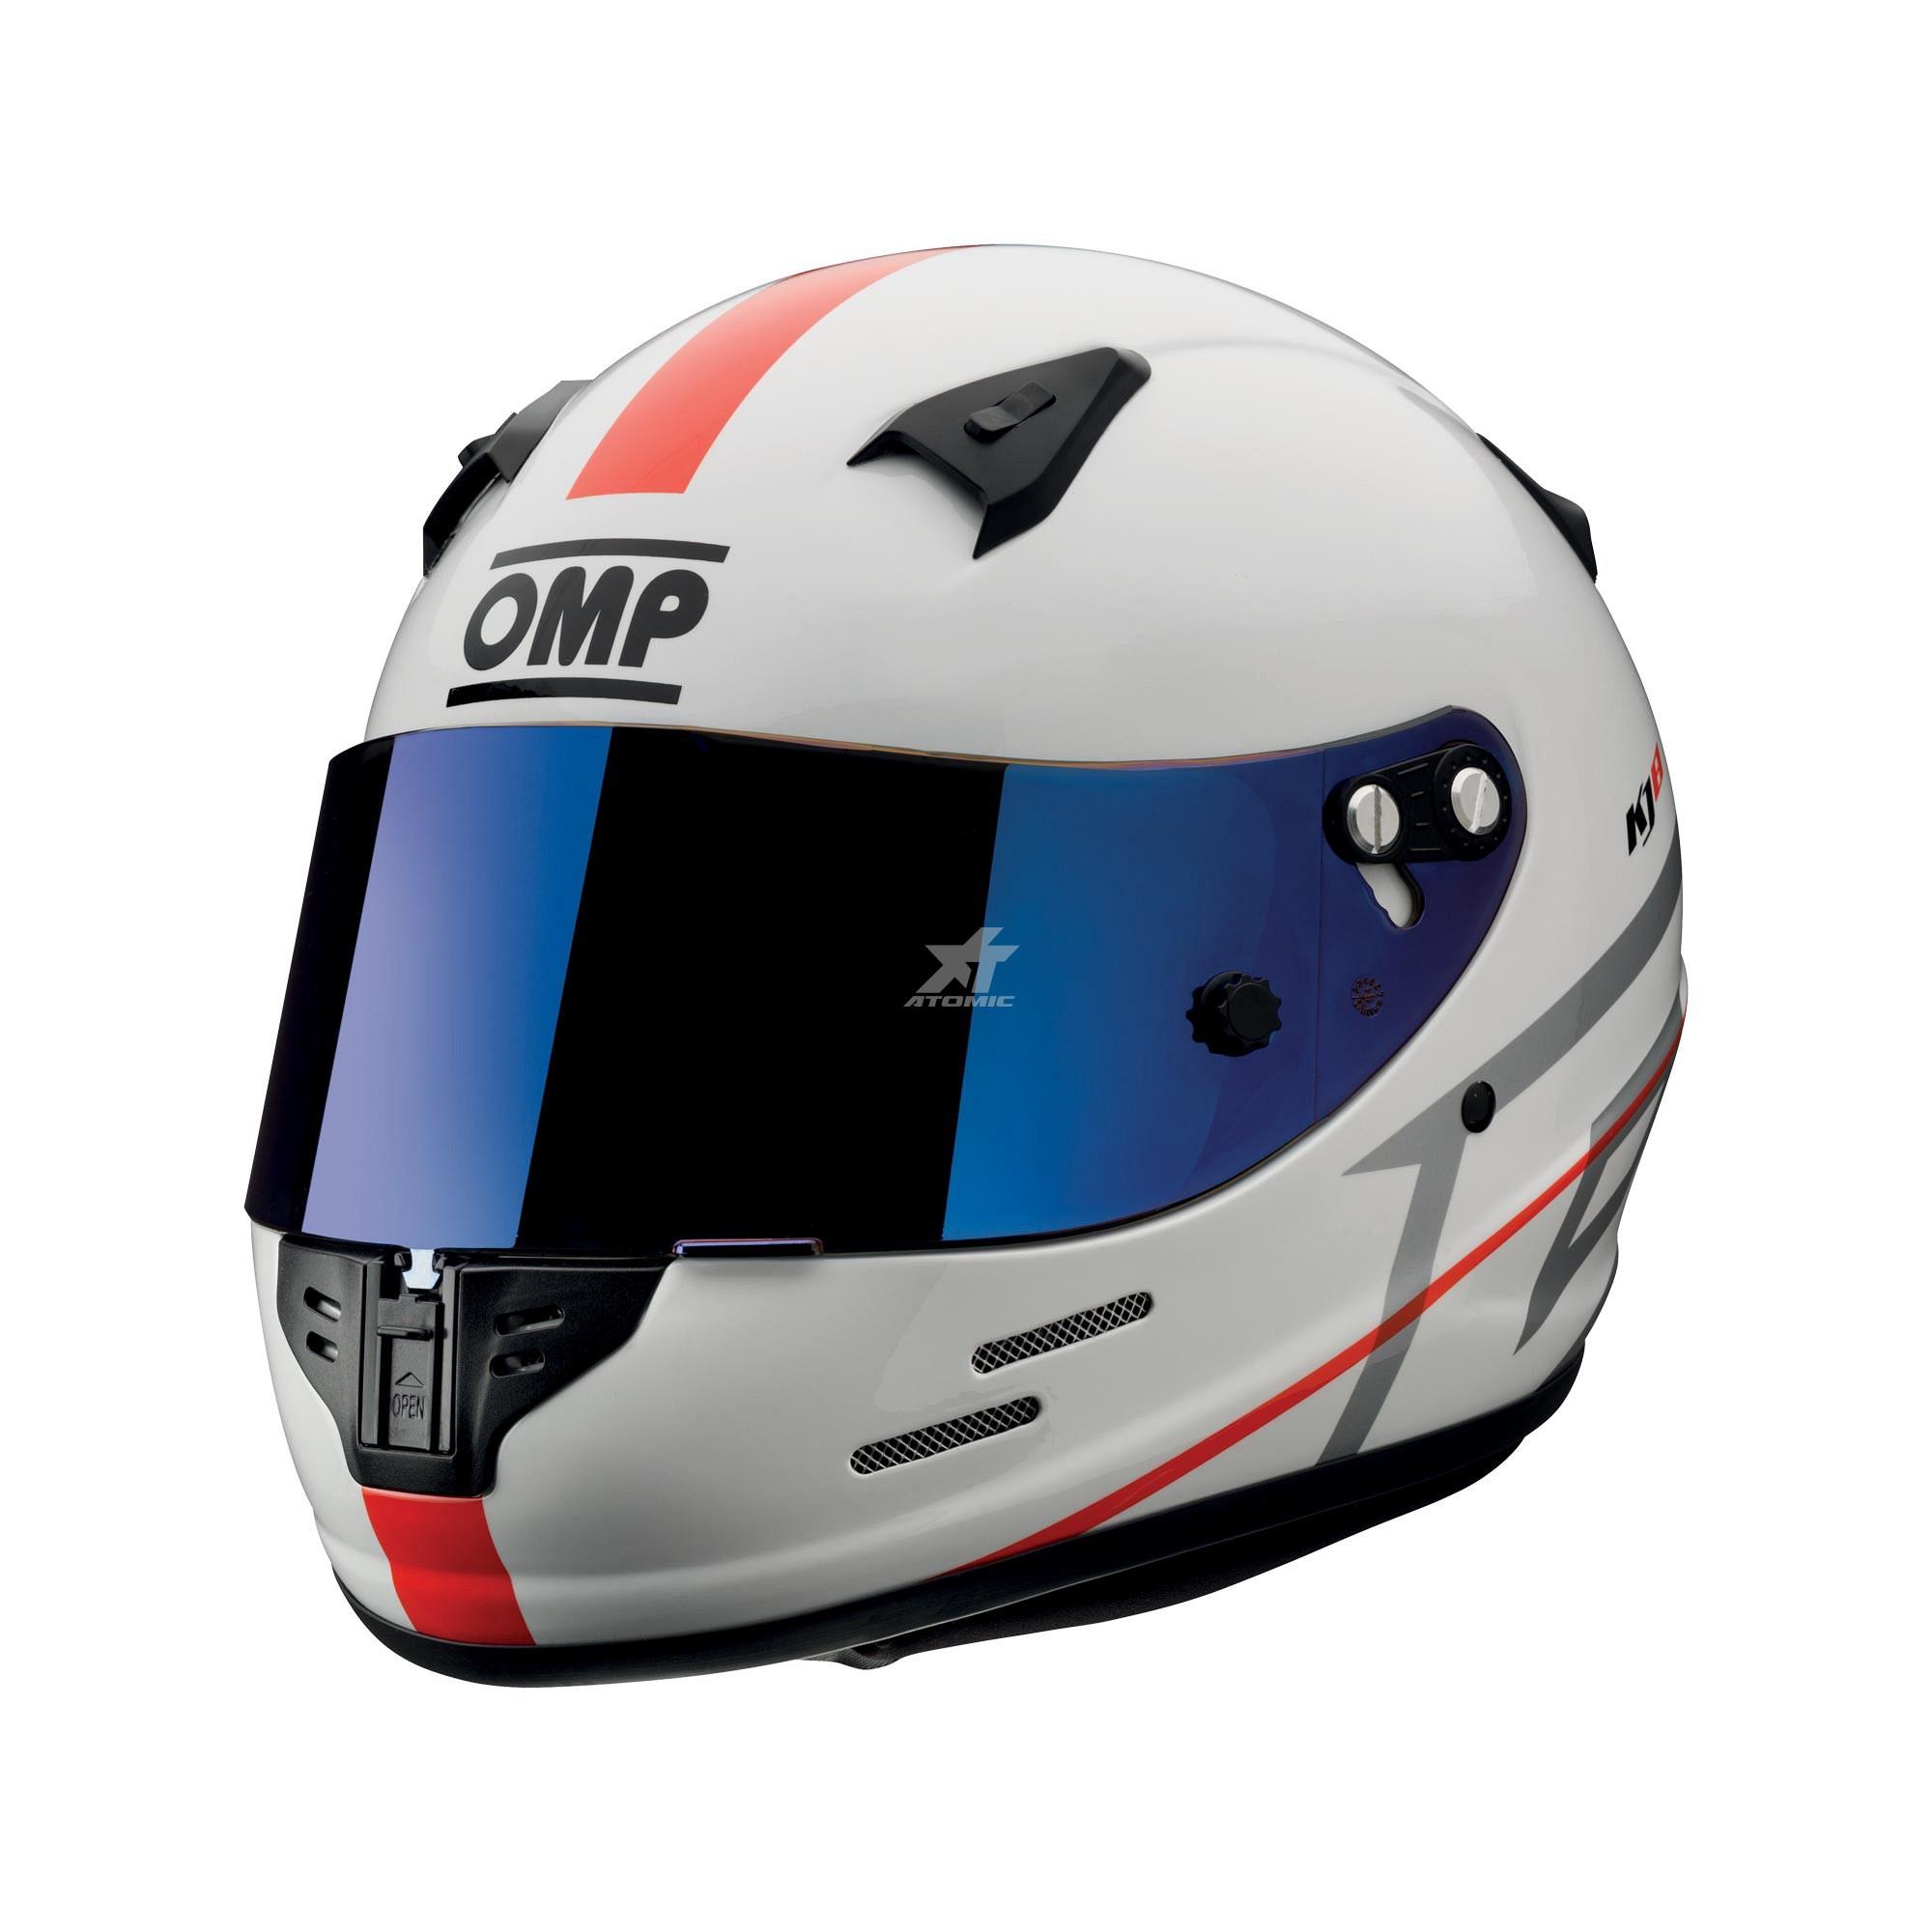 Шлемы для автоспорта